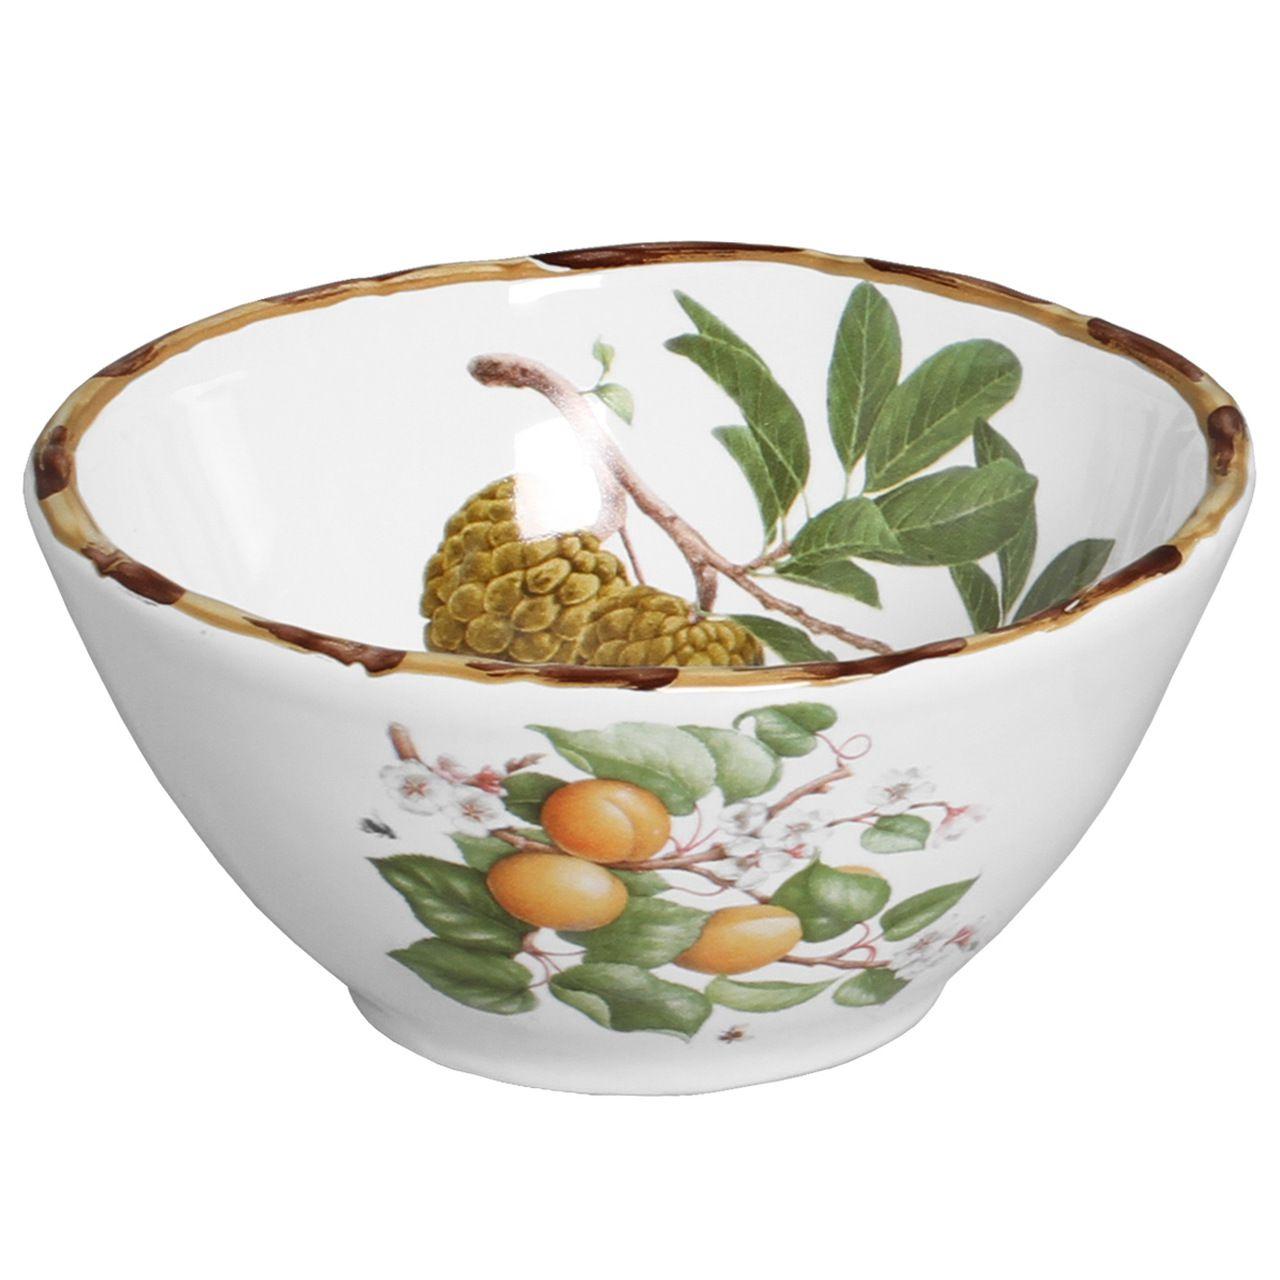 Bowl Tropical Fruits (06 Unidades) Cód.: 6049 - MB